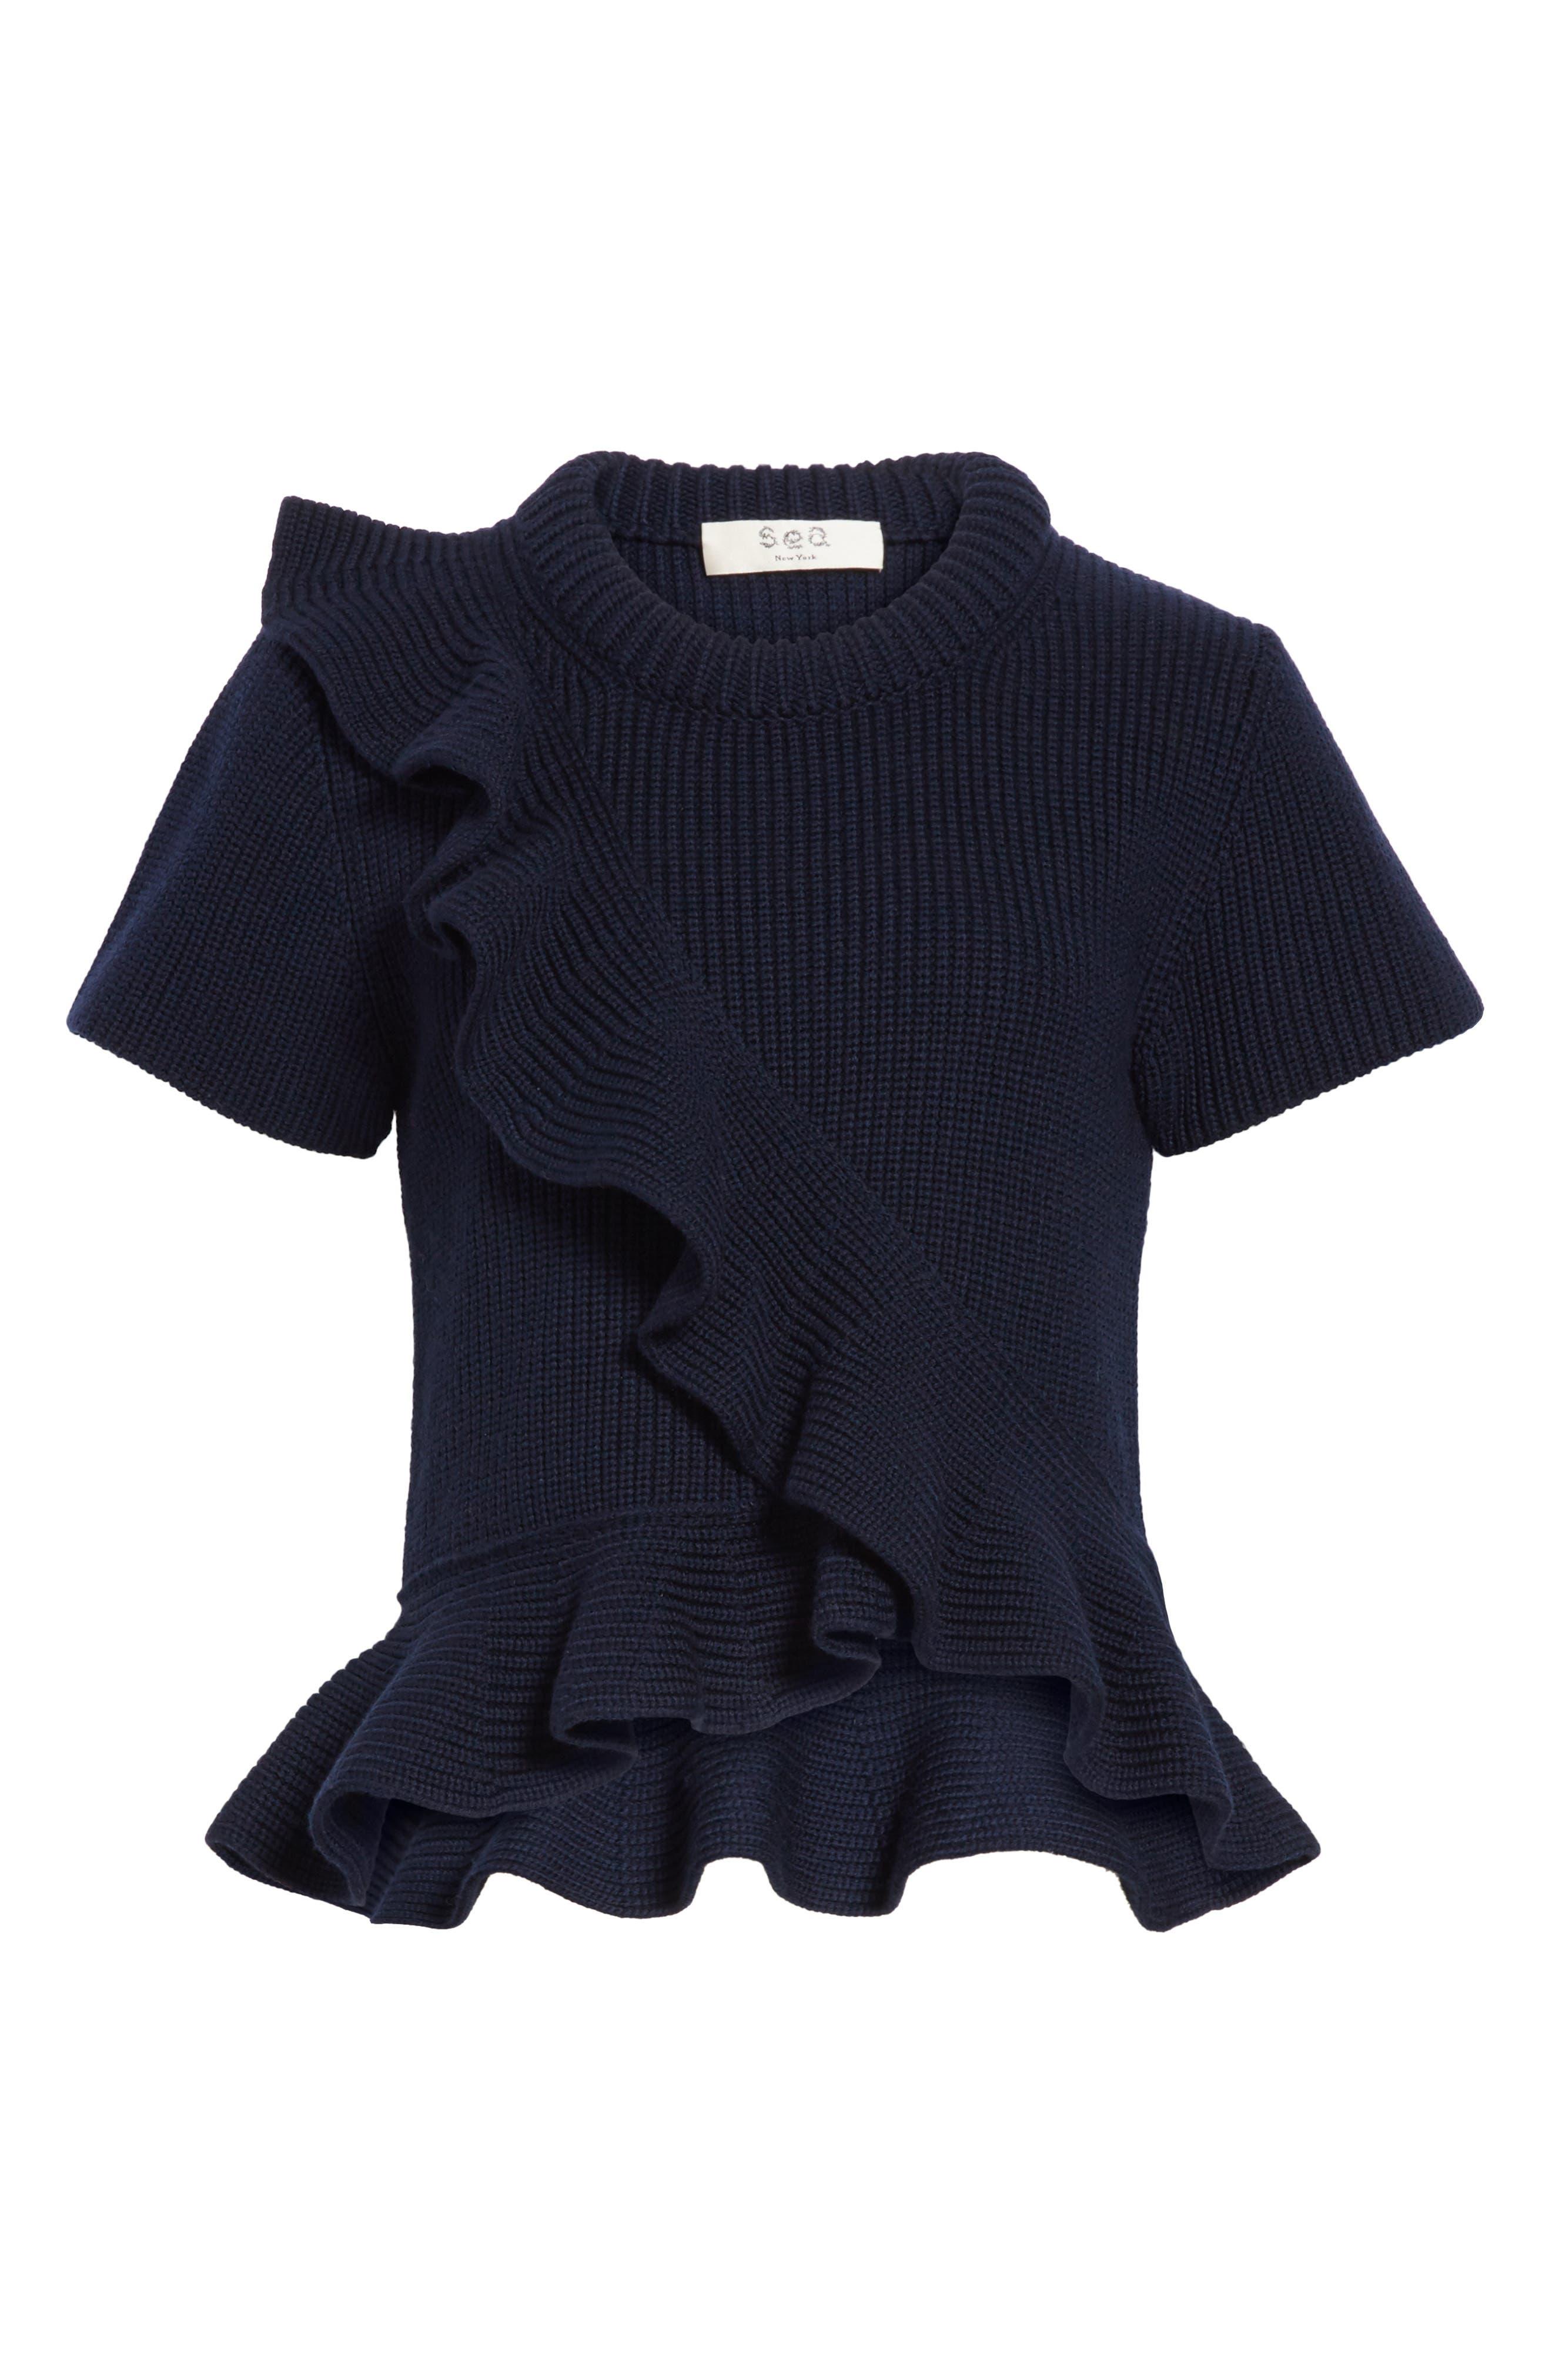 Ruffle Wool Sweater,                             Alternate thumbnail 6, color,                             Navy